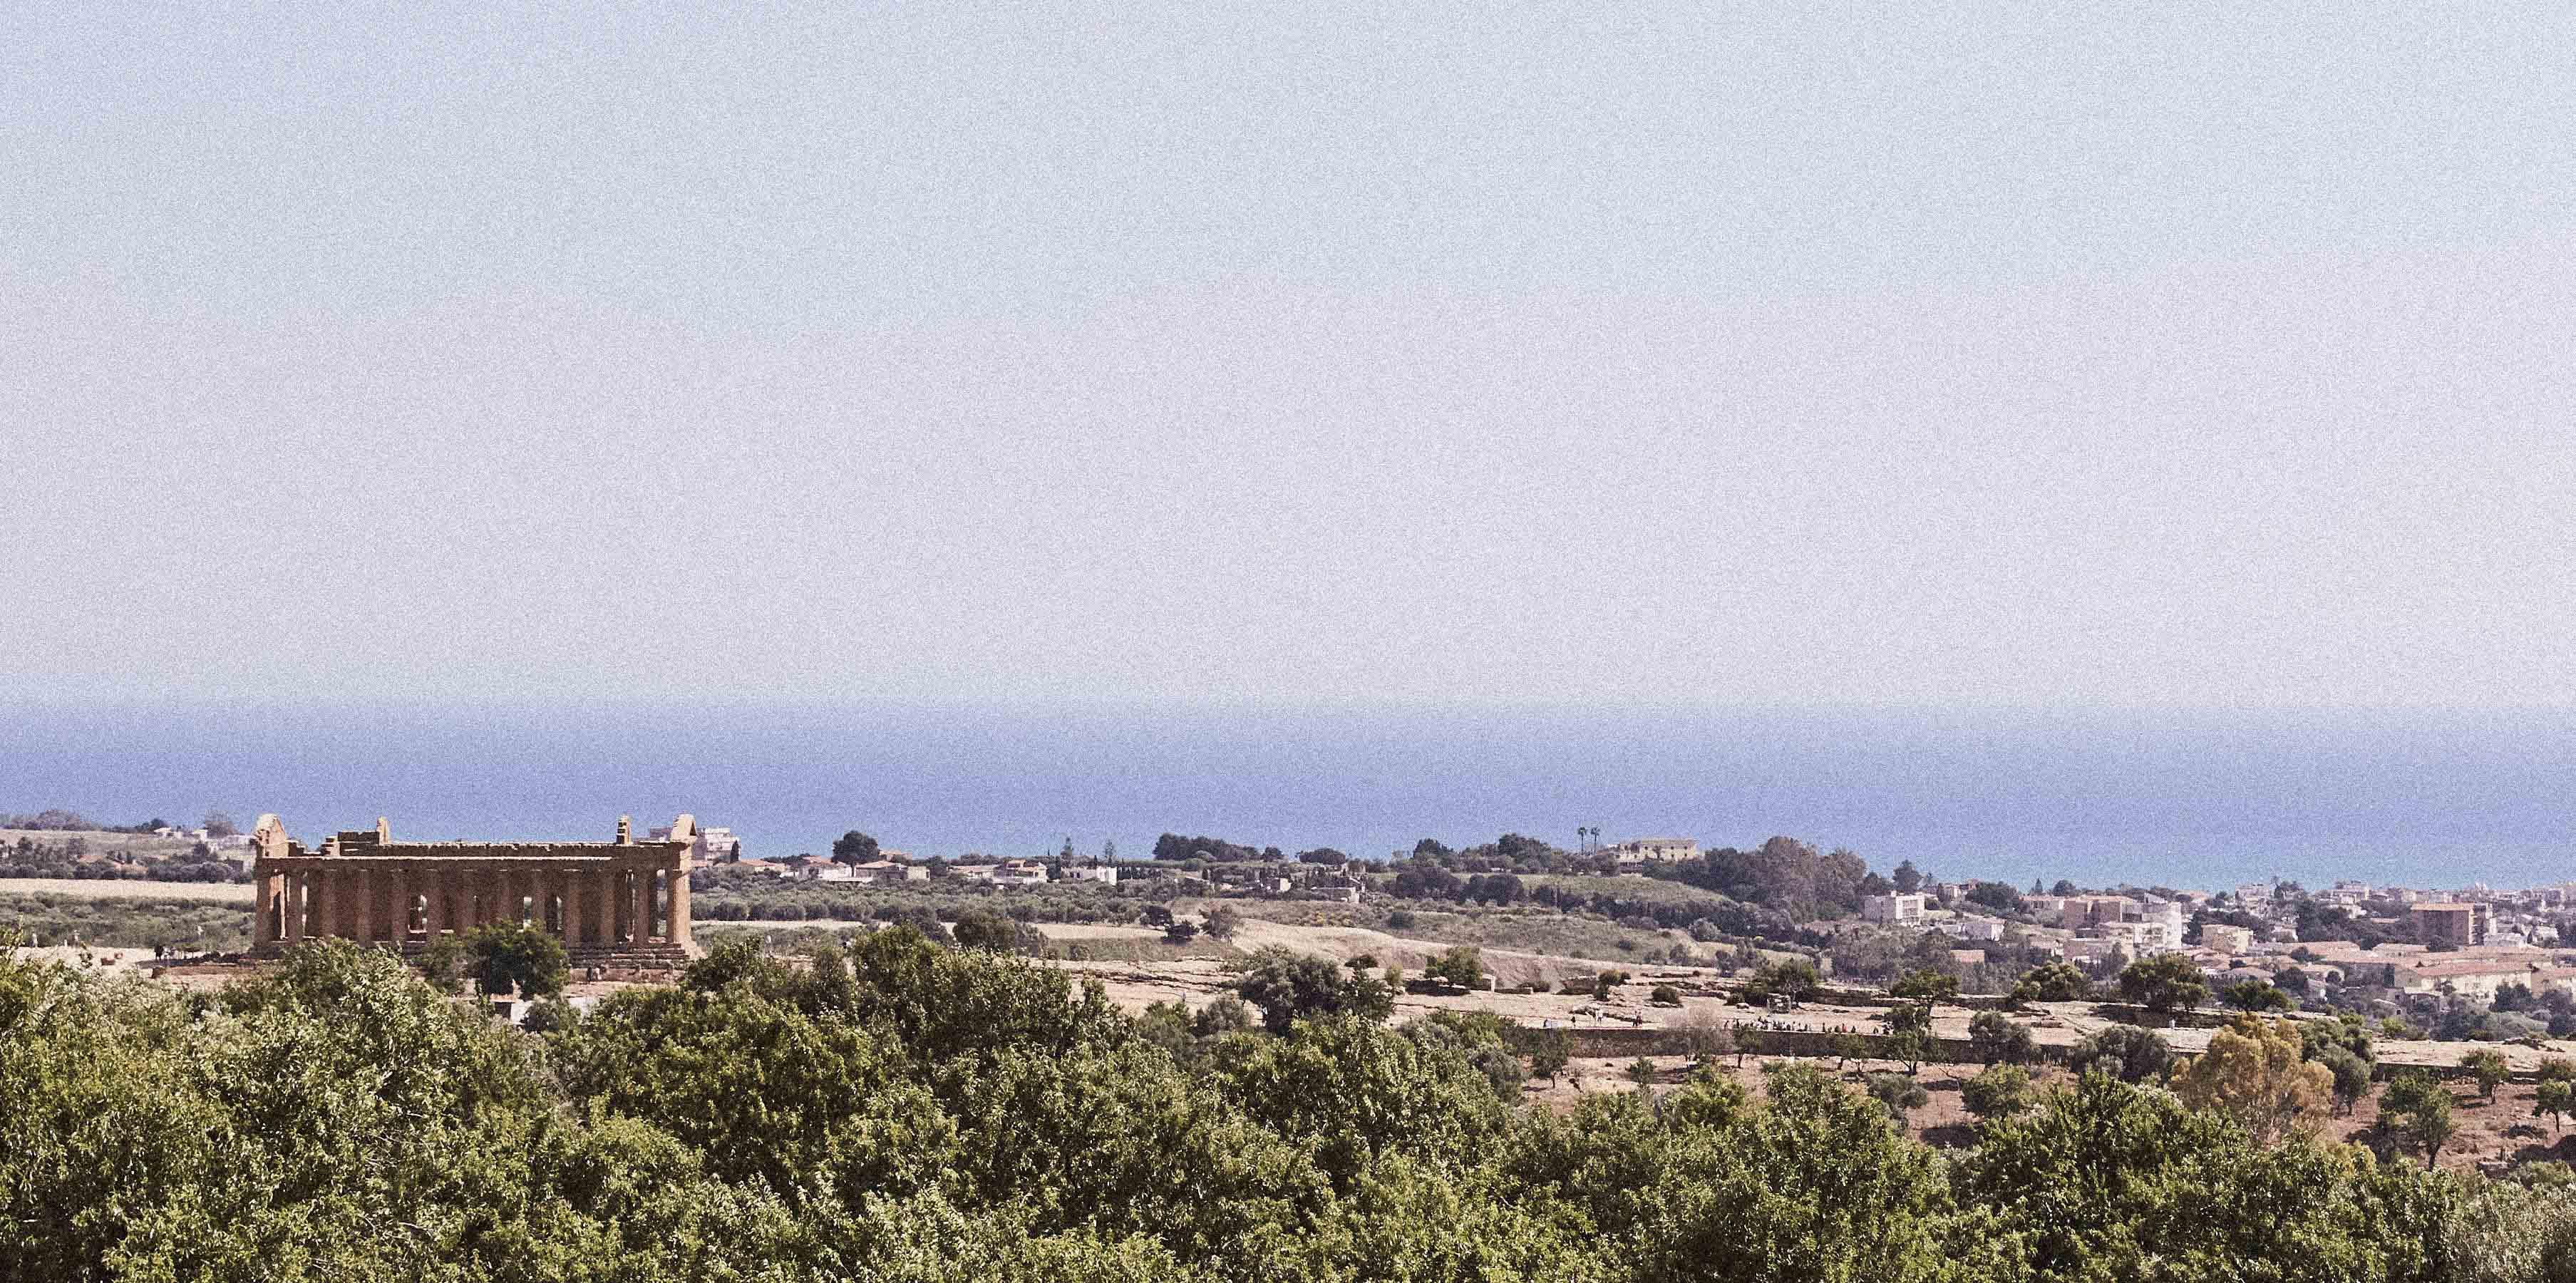 Sicily_0619_0P4A7819_X